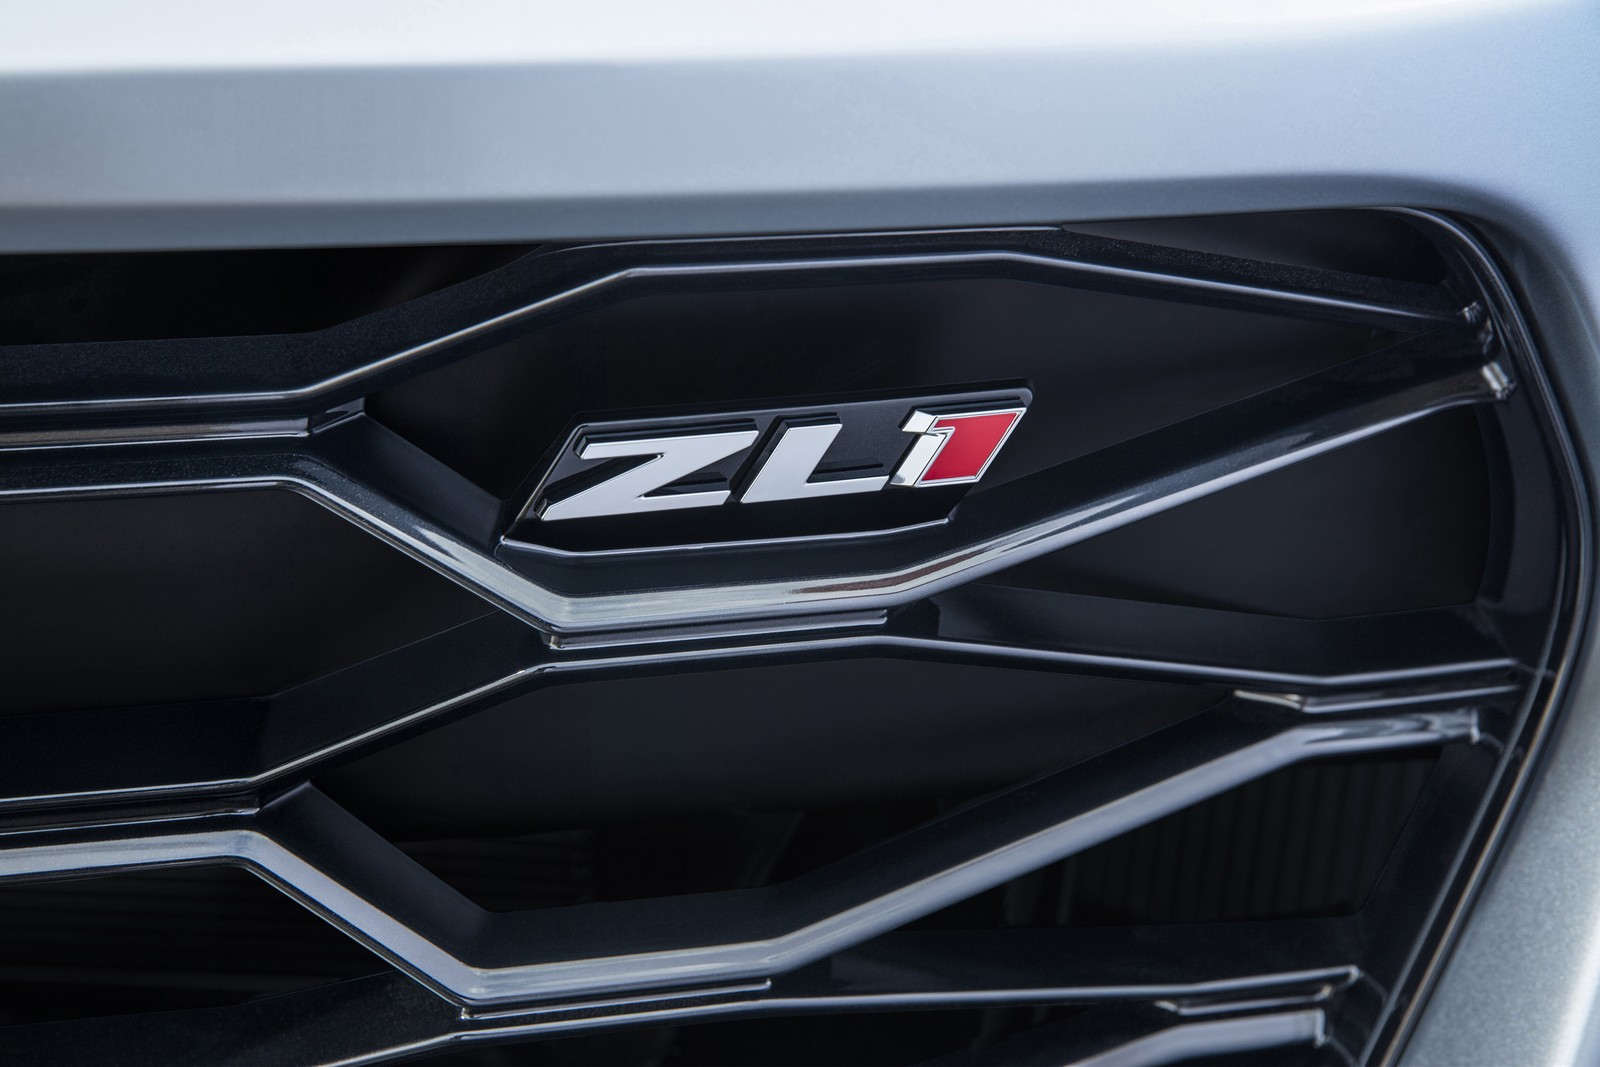 Chevrolet Camaro ZL1 2017